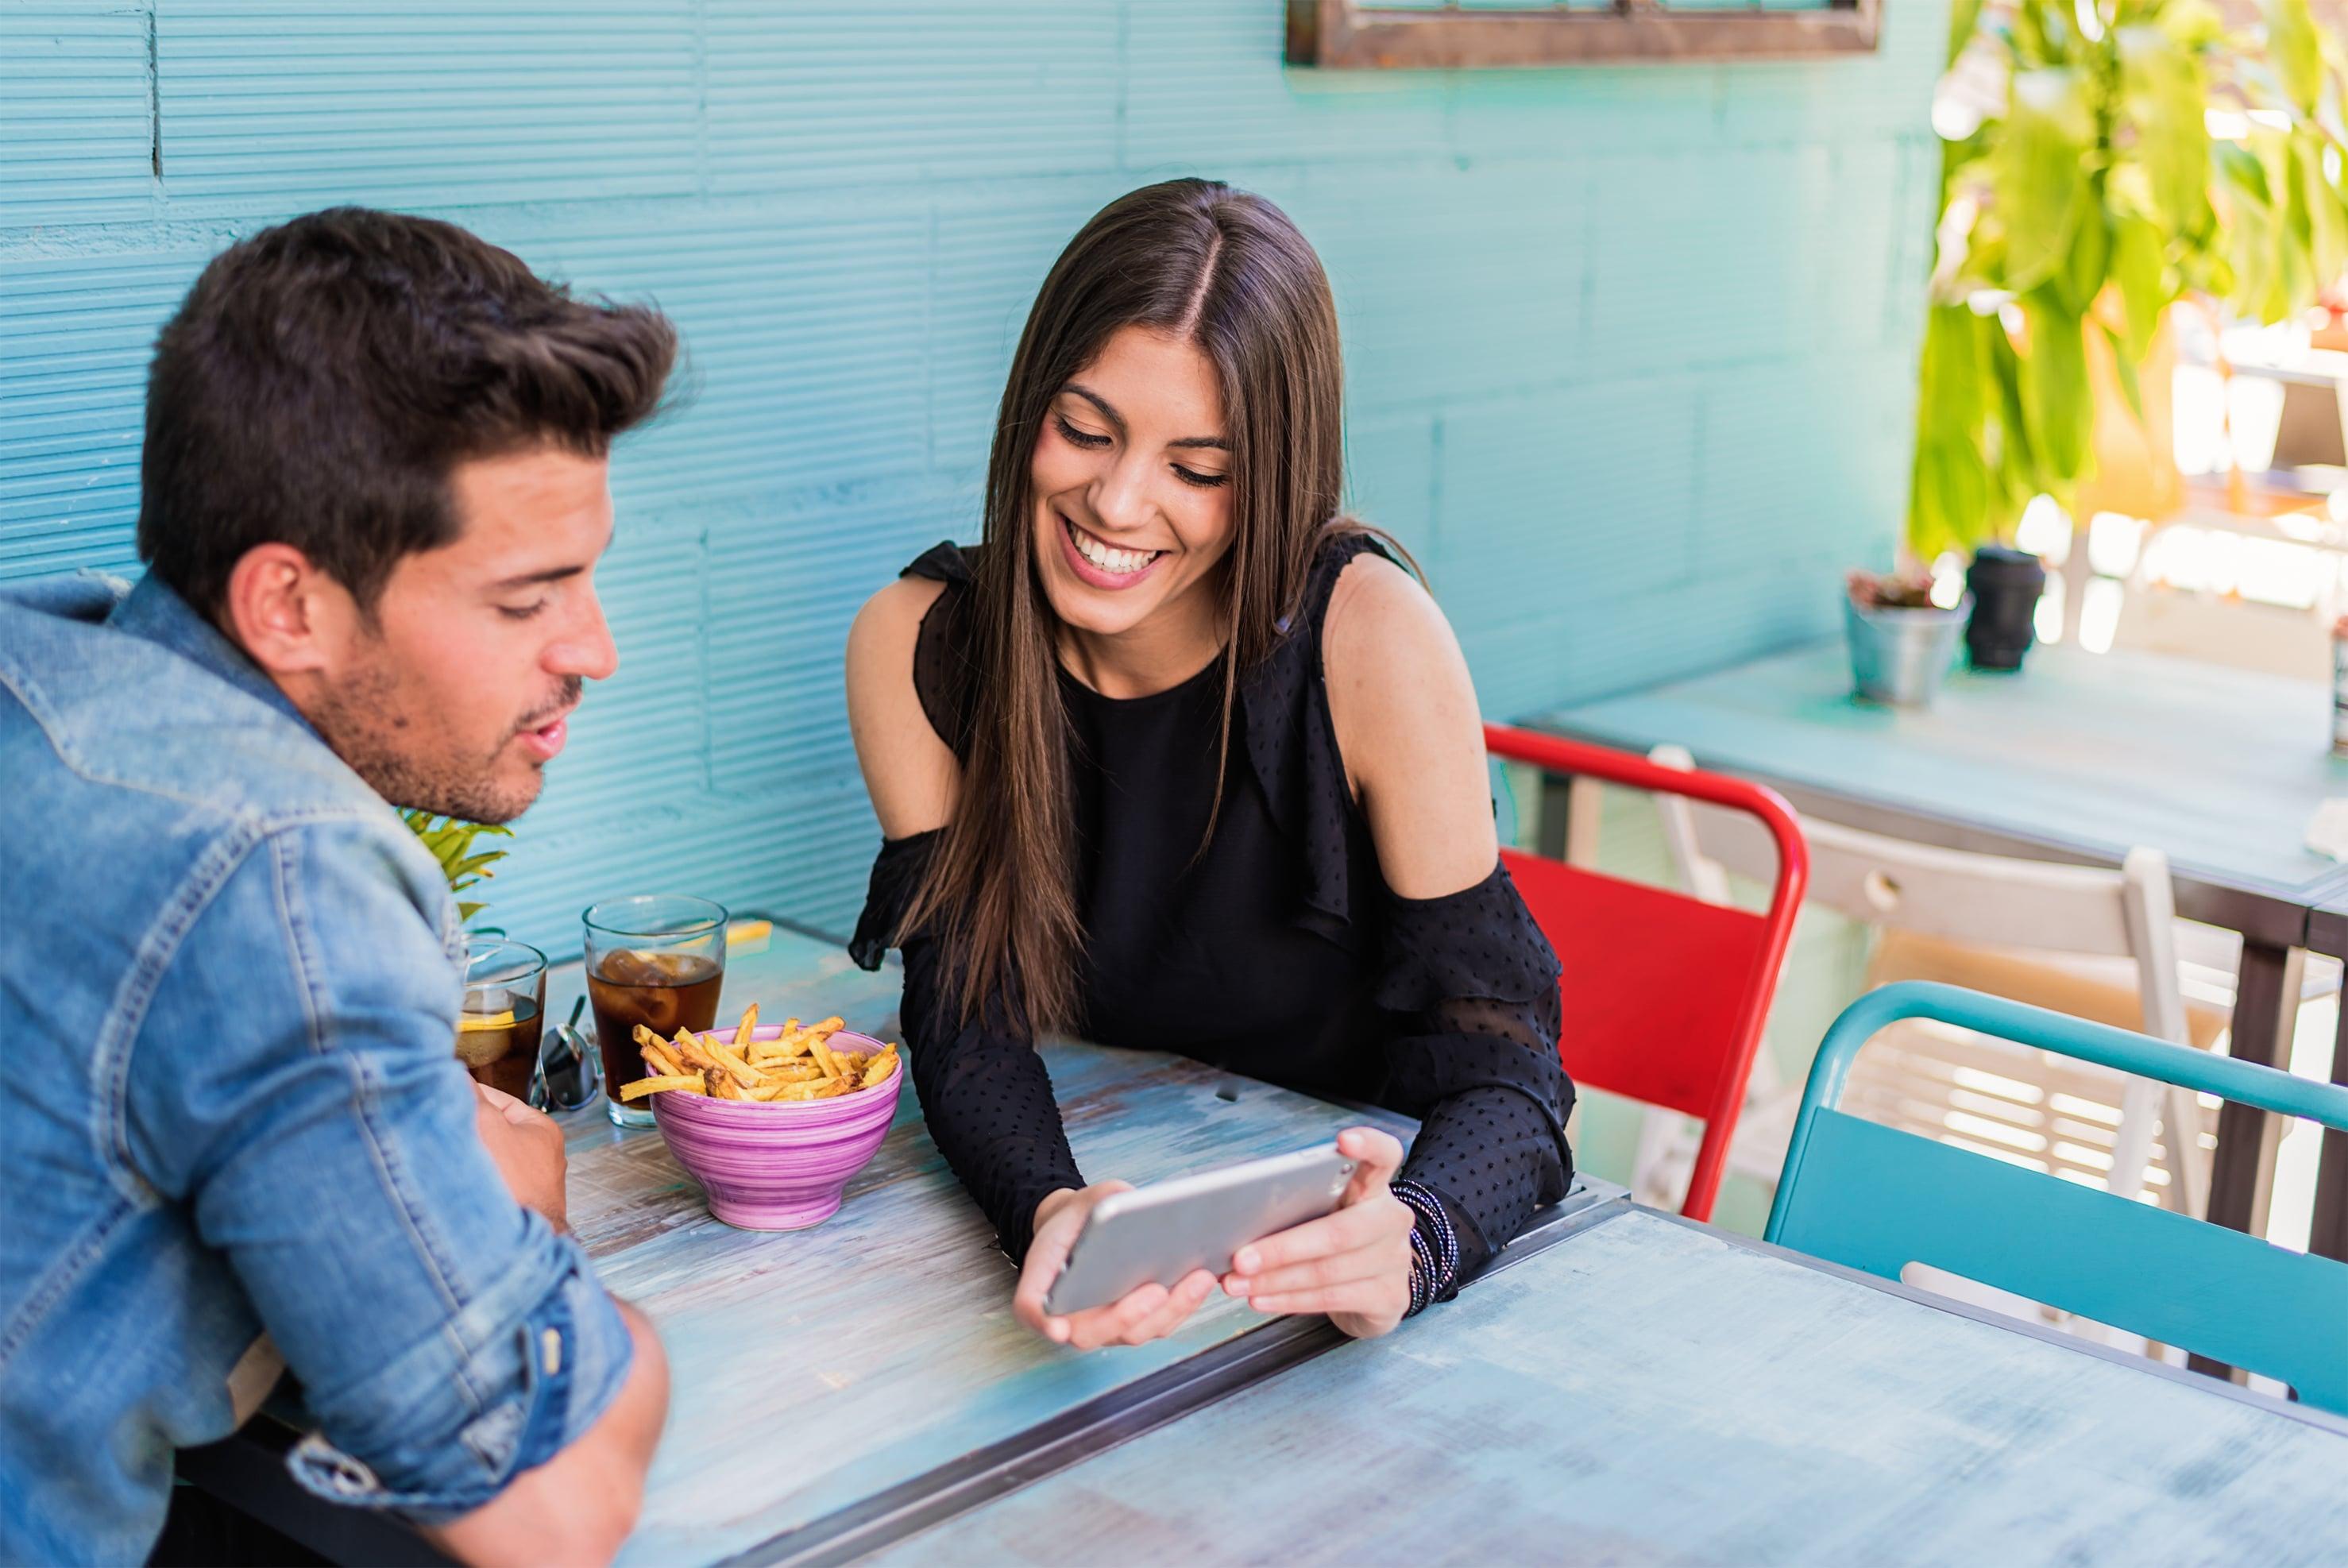 5 benefits of having a mobile ordering system vs restaurant app